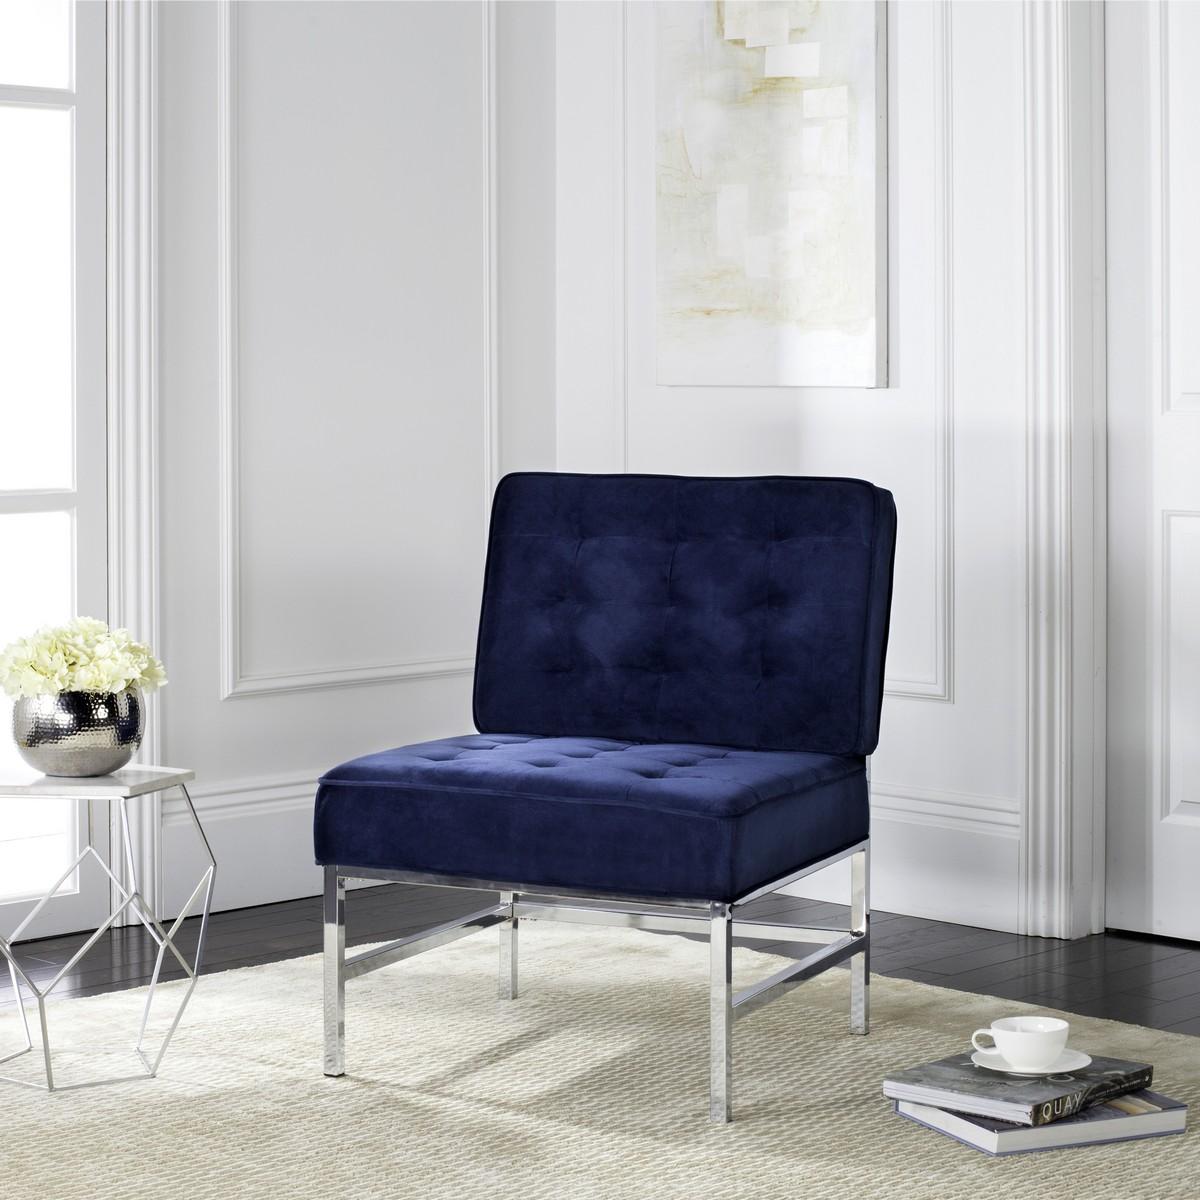 Amazing Fox6268B Accent Chairs Furniture By Safavieh Machost Co Dining Chair Design Ideas Machostcouk